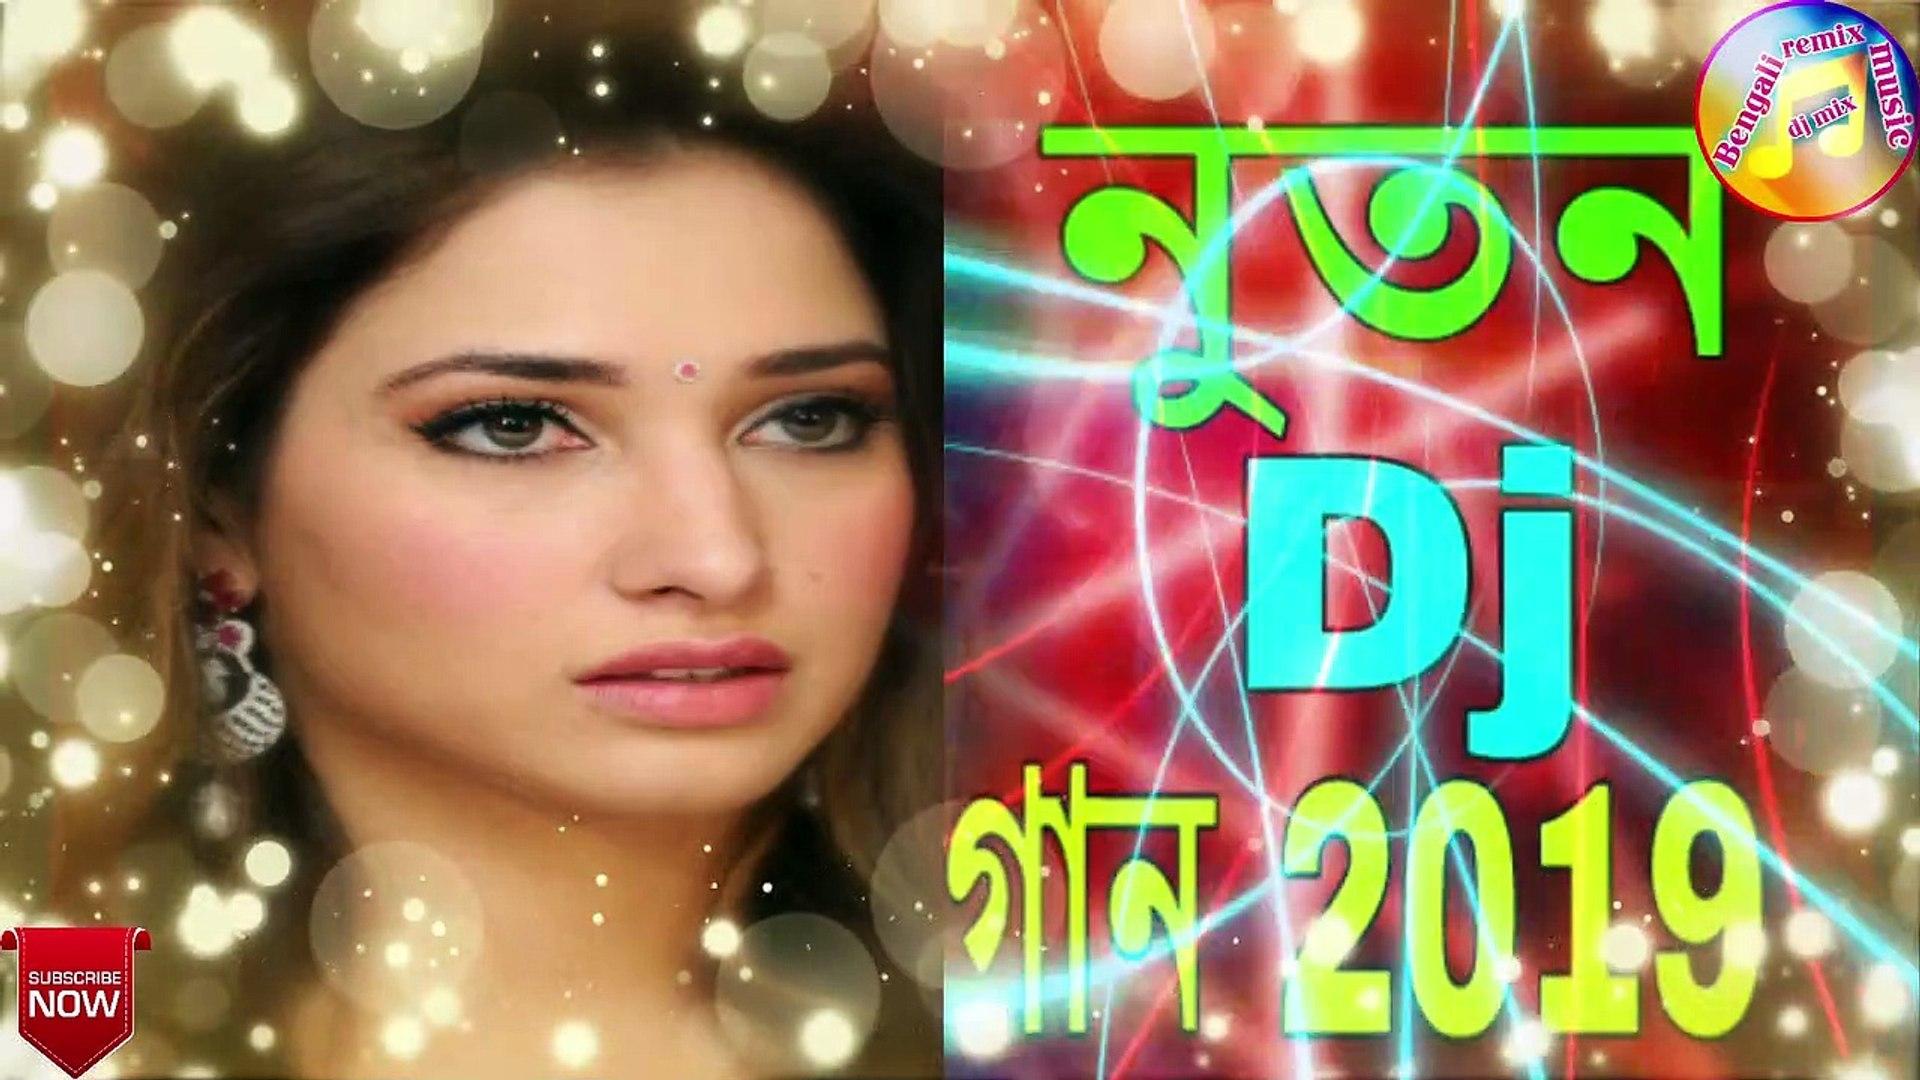 Happy New Year 2019 Dj Song Status#New Dj Remix 2019#Party Mix 2019#bengali  remix music dj mix